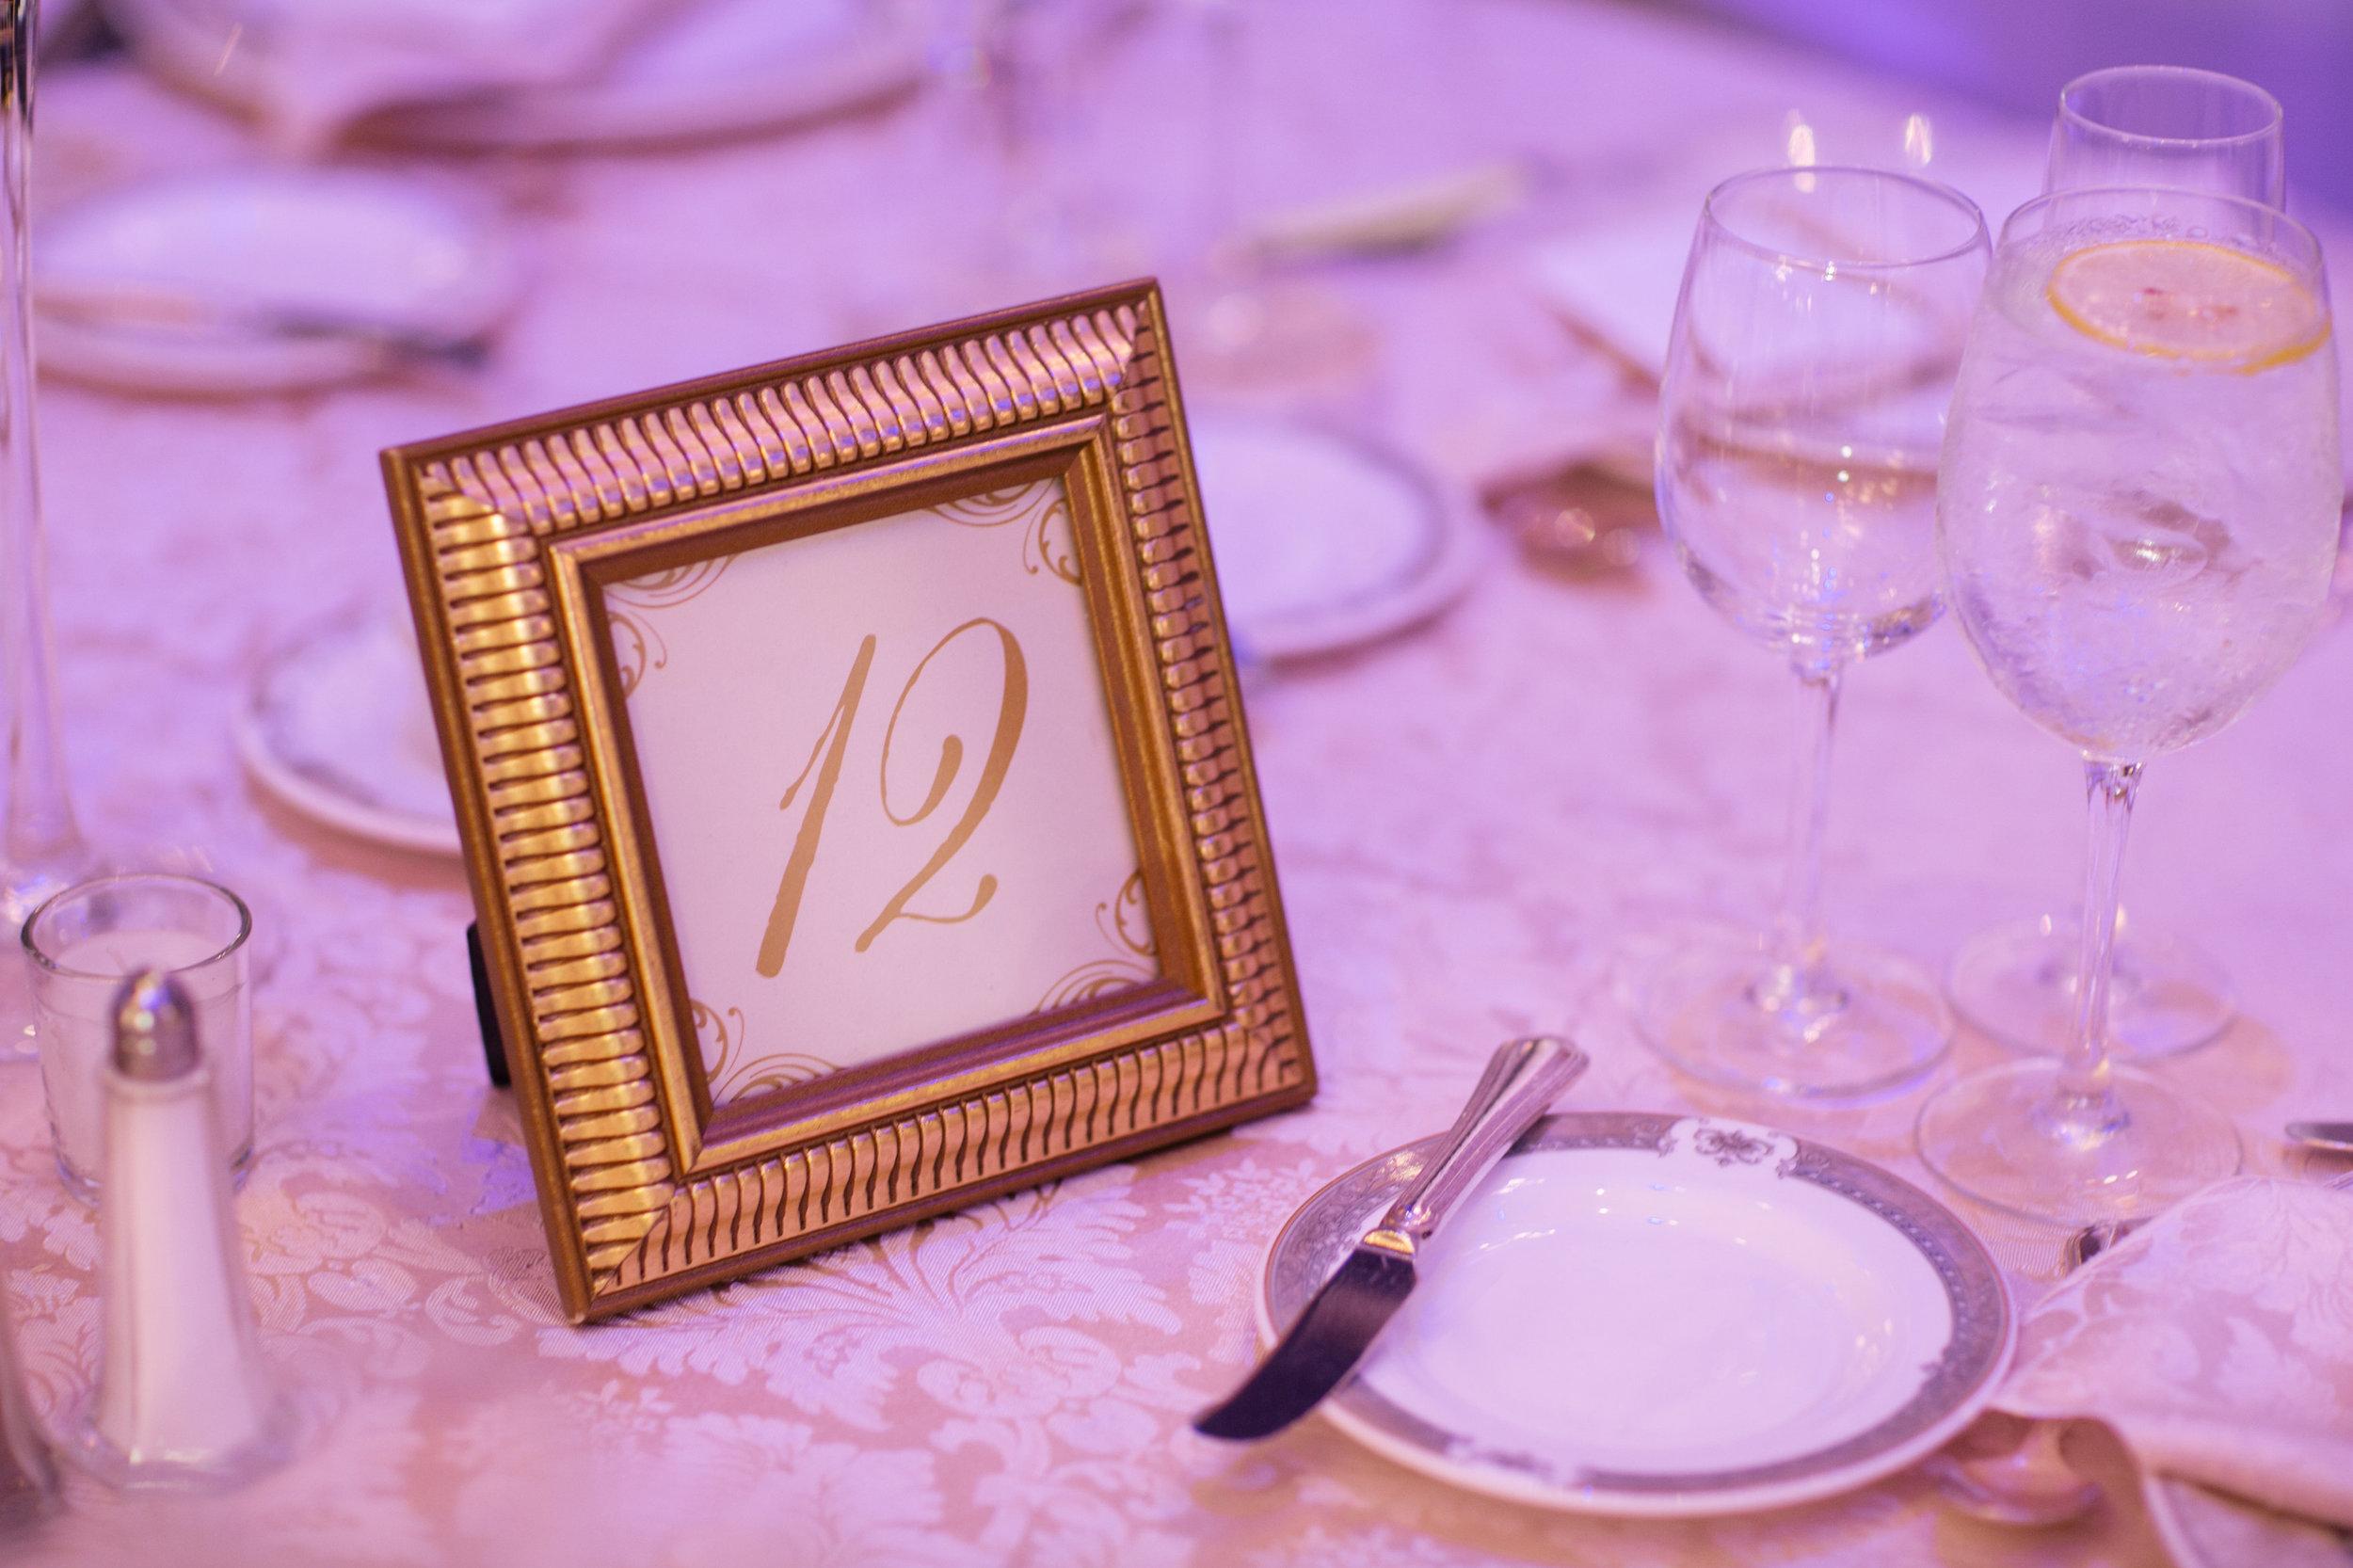 Ceci_New_York_Custom_Invitation_ New_Jersey_Wedding_Luxury_Personalized_Ceci_Style_Bride_Foil_Stamping52.jpg